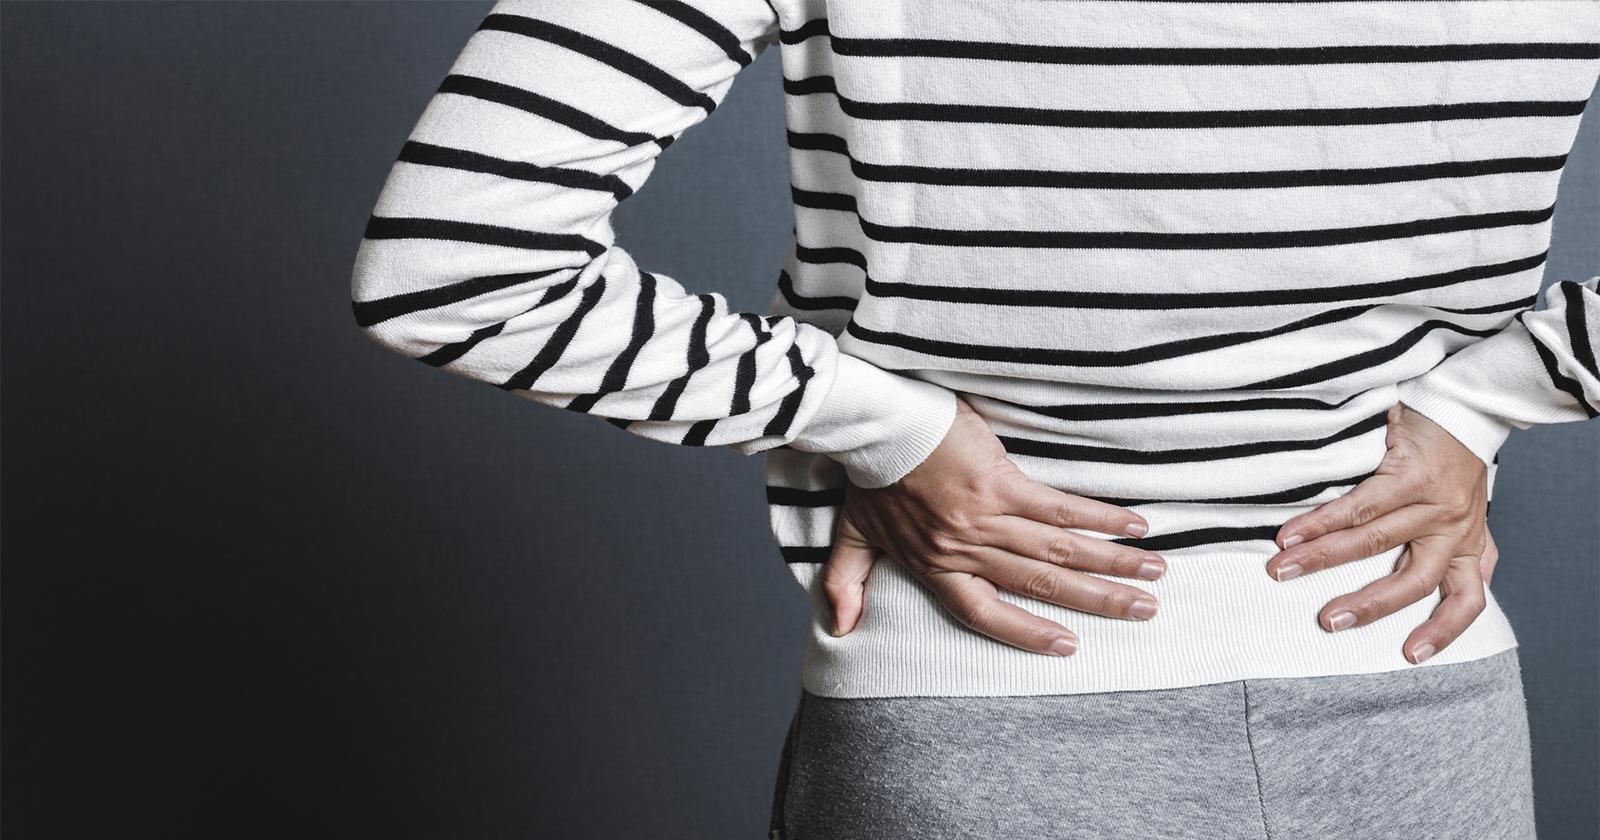 Rückenschmerzen & Nervenschädigung - ratgeber-nerven.de